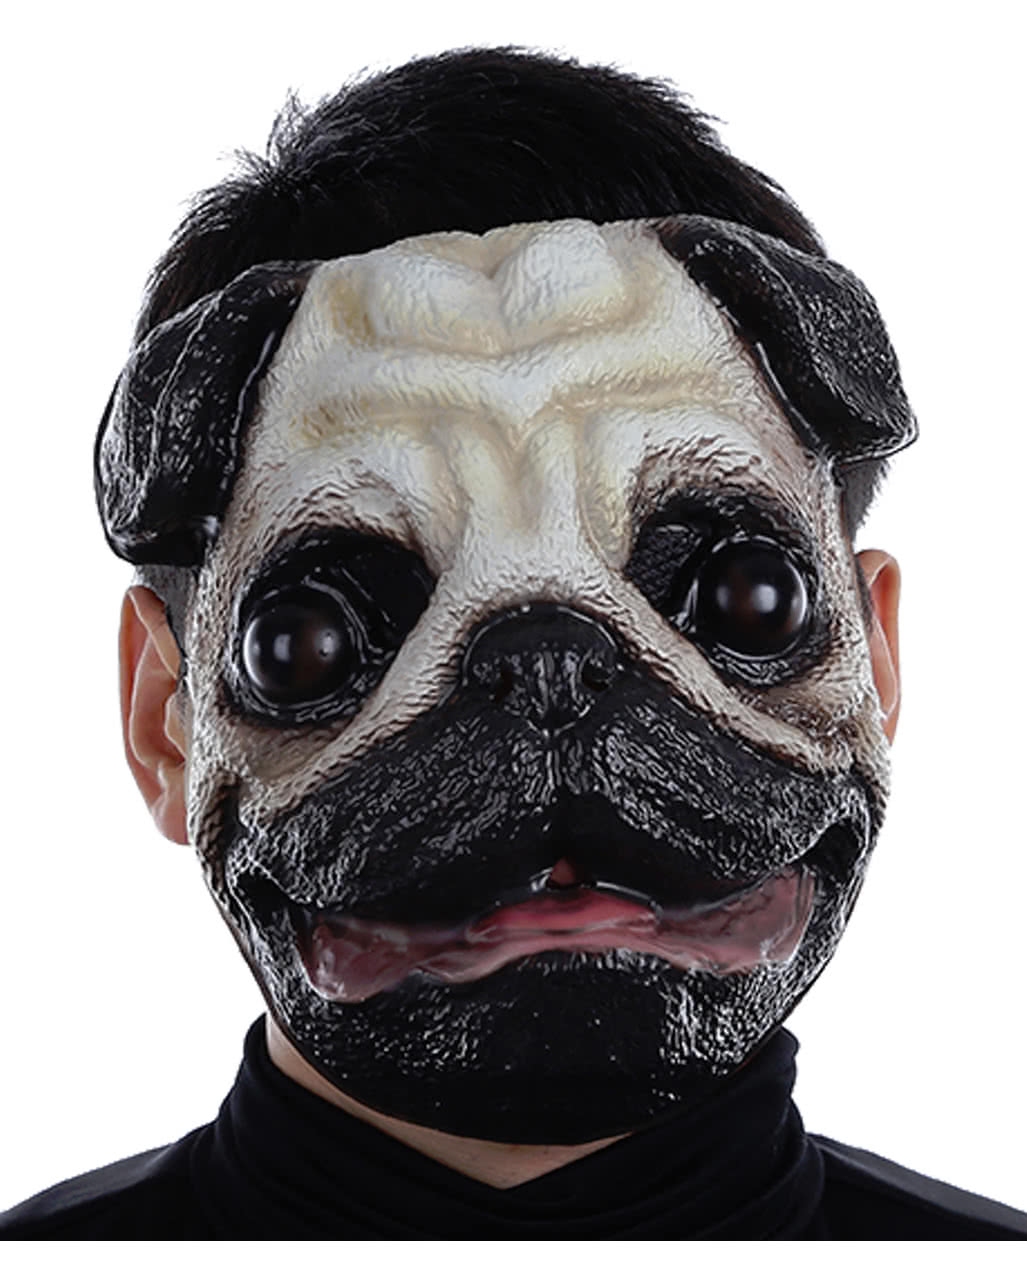 a776fce5 Pug dog mask plastic | Buy Cheap masks | horror-shop.com